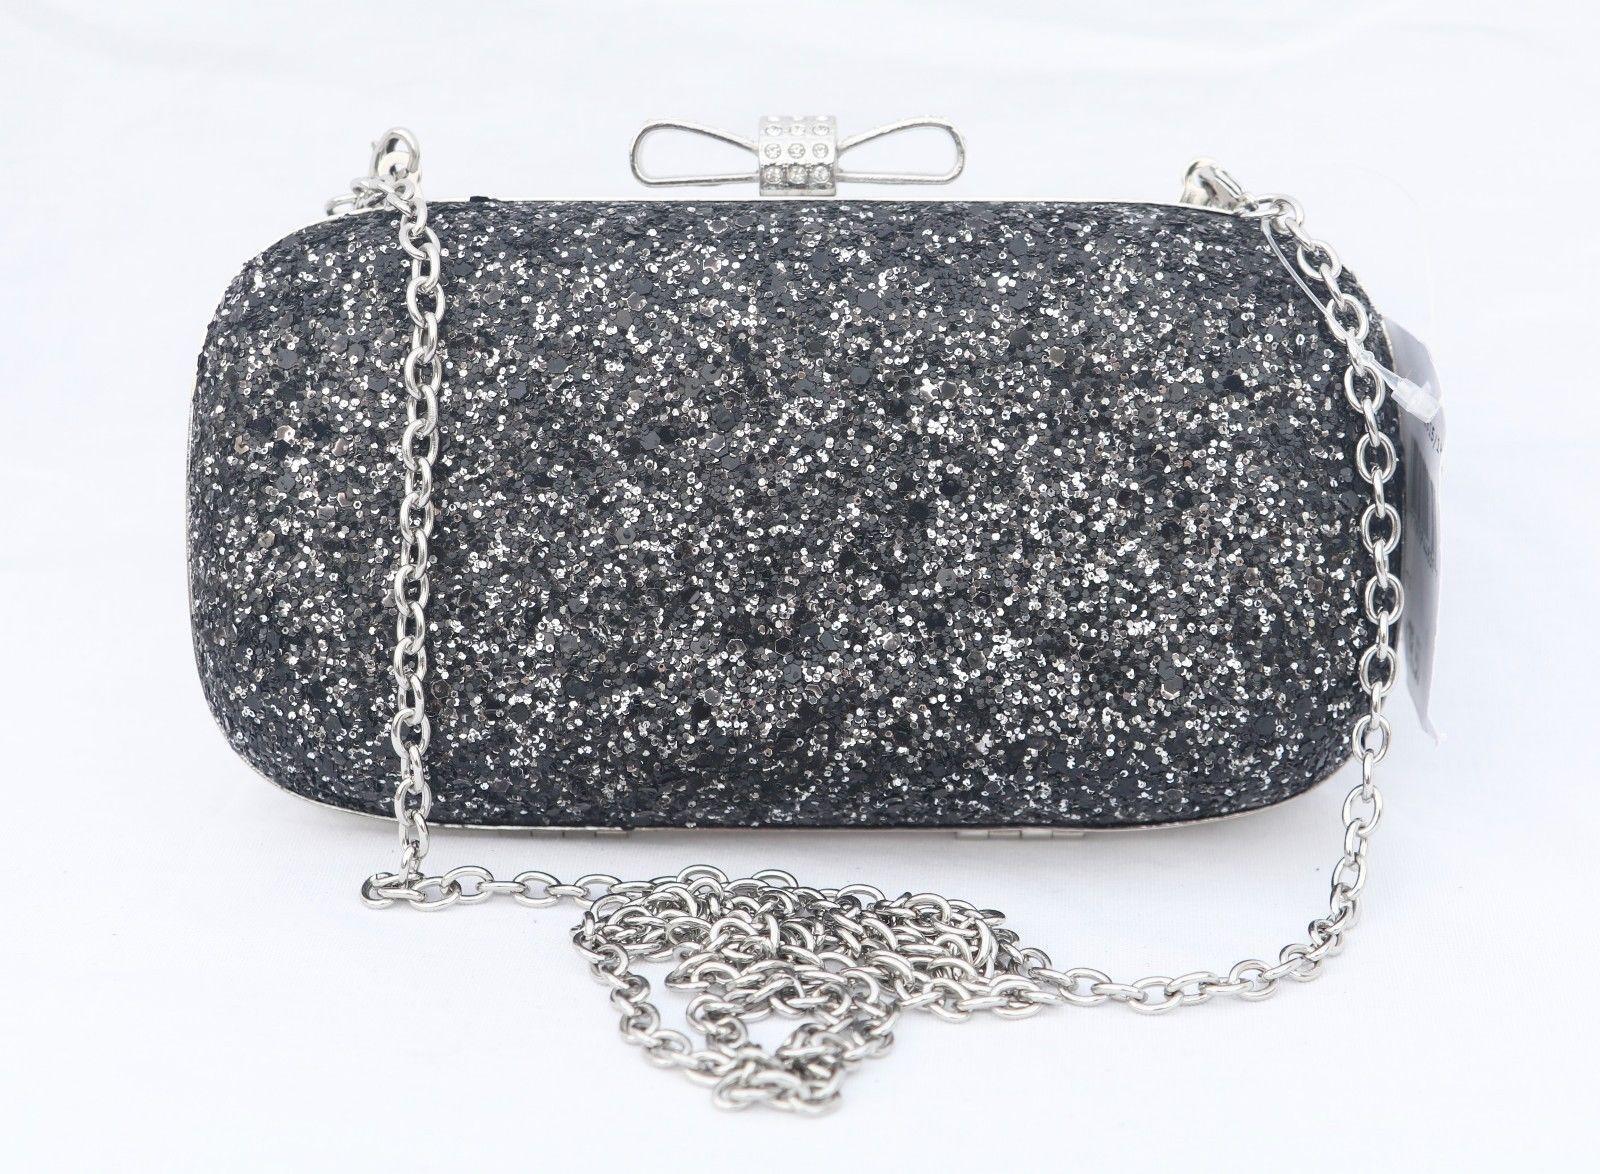 317d19f4c801 18.00 | INC International Concepts Evie Black Silver Glitter Clutch ...